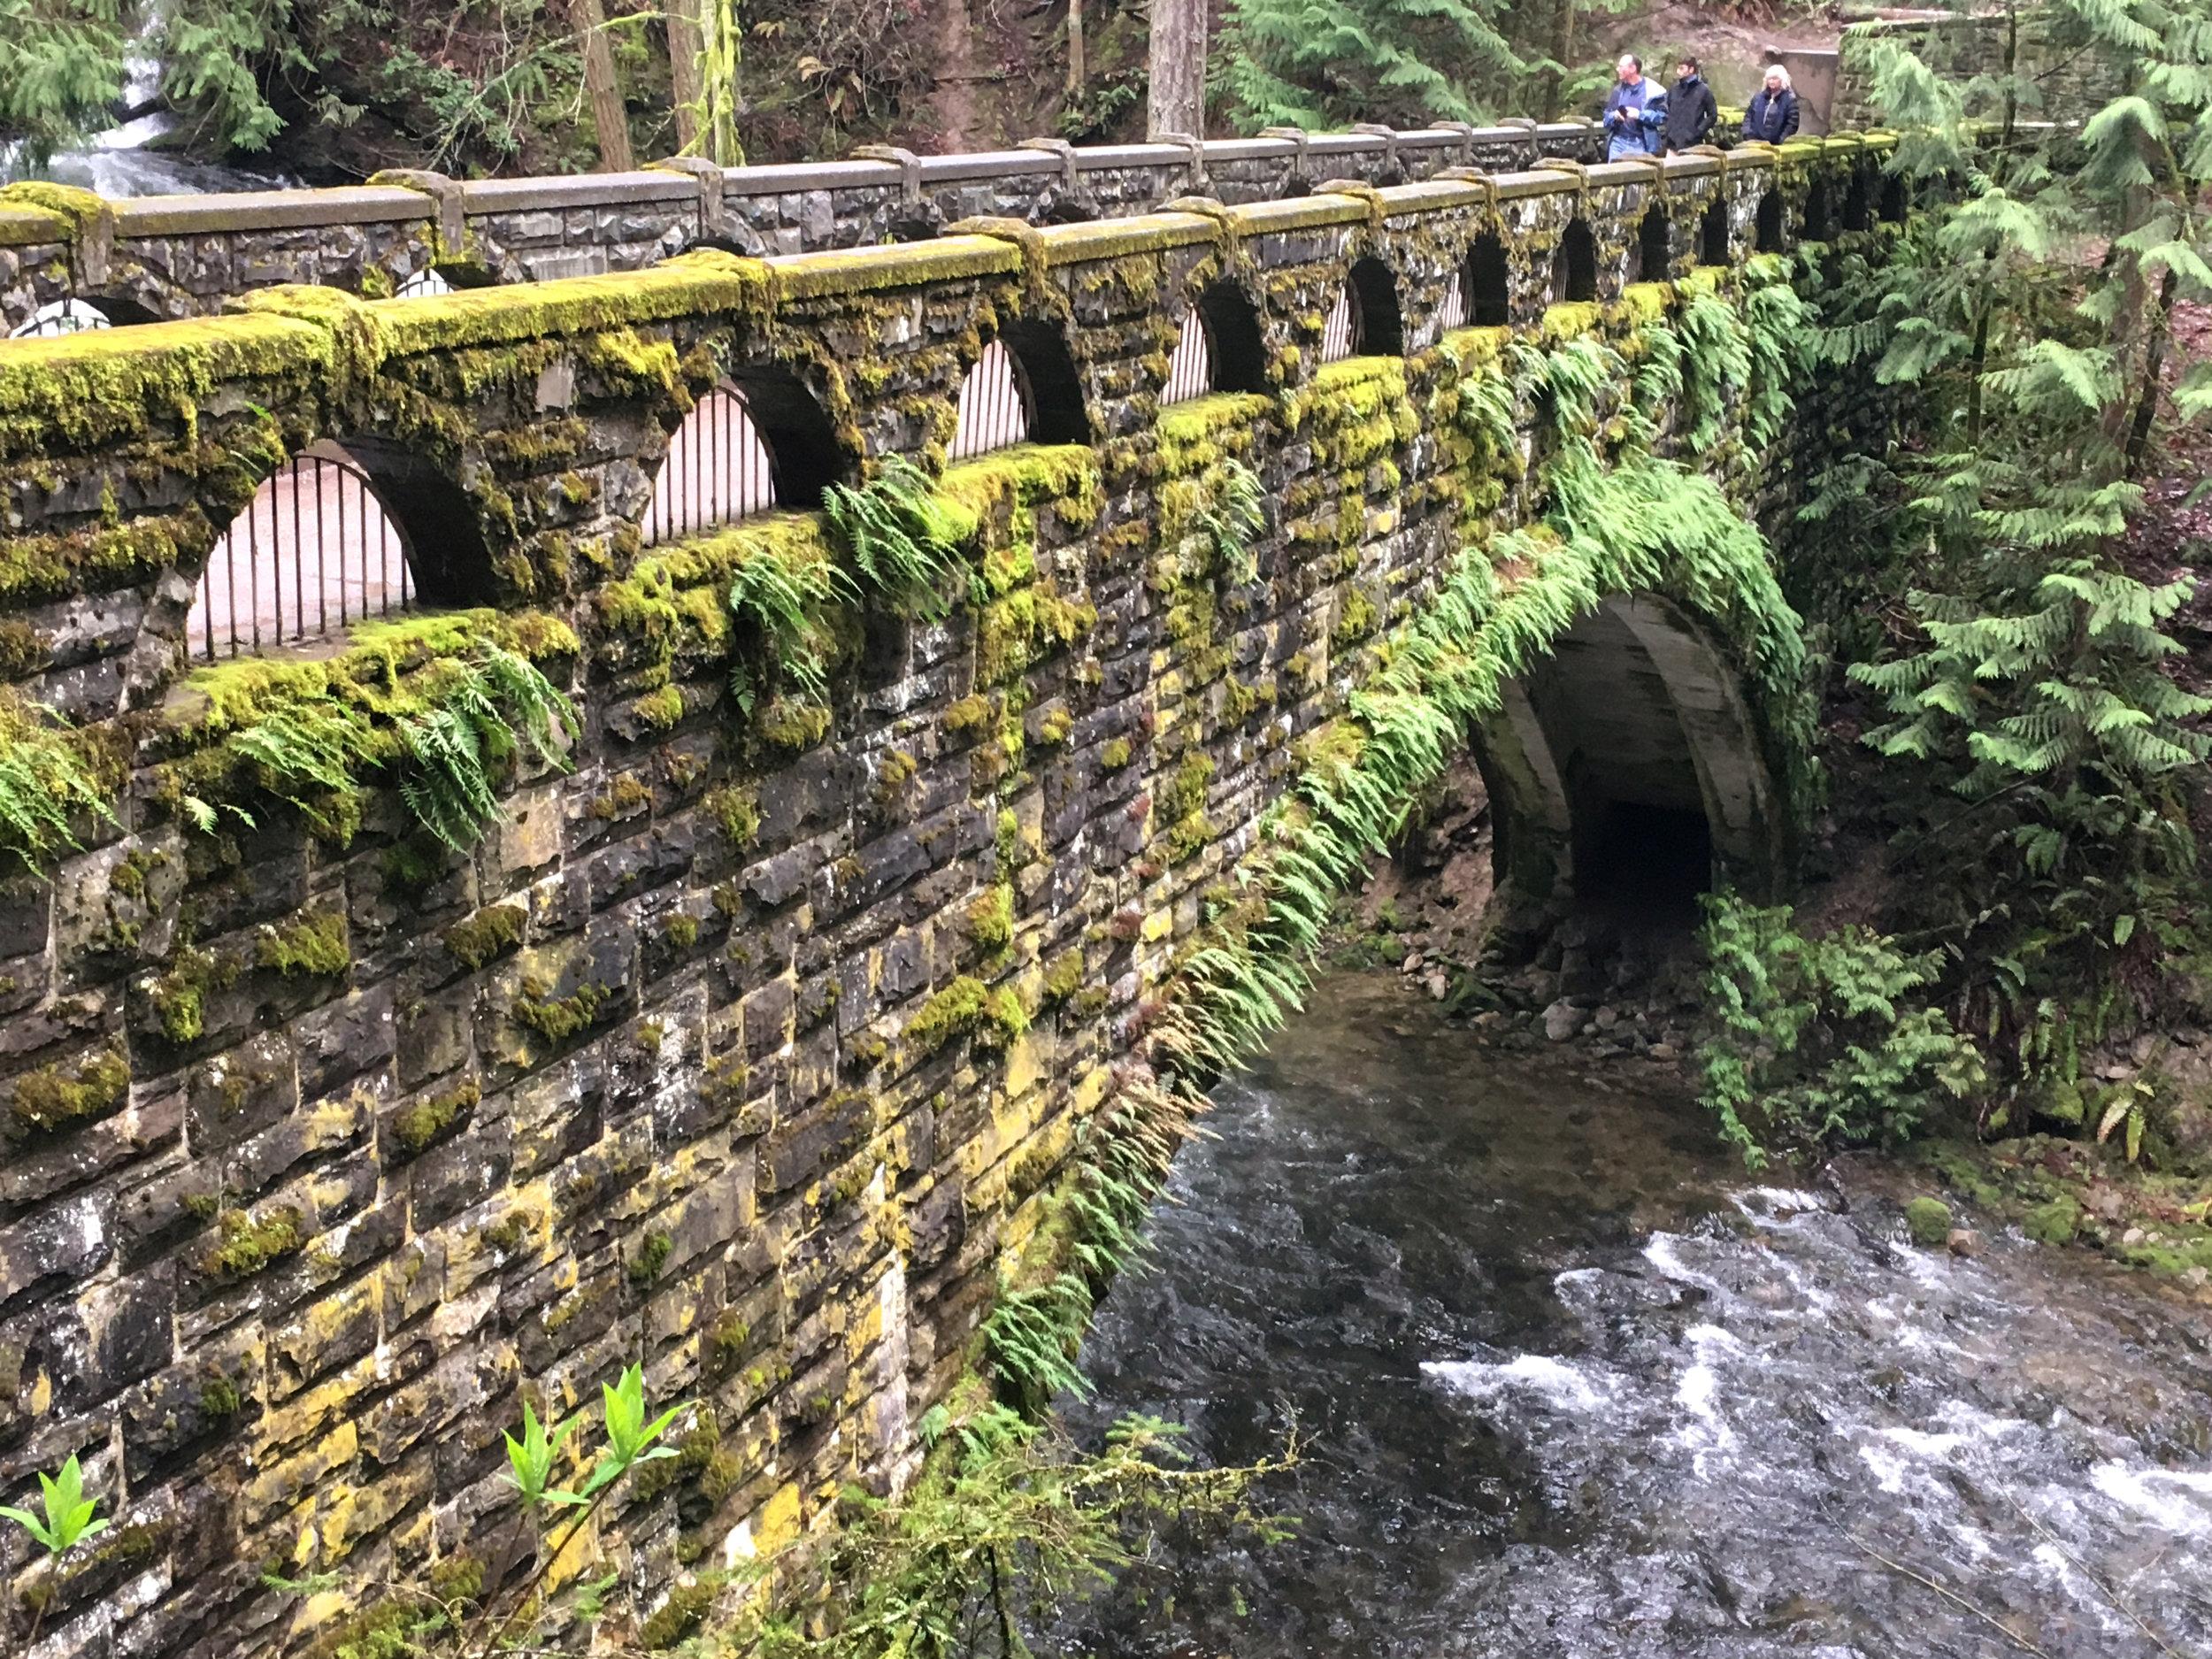 The Works Progress Administration-built stone bridge crossing Whatcom Creek.